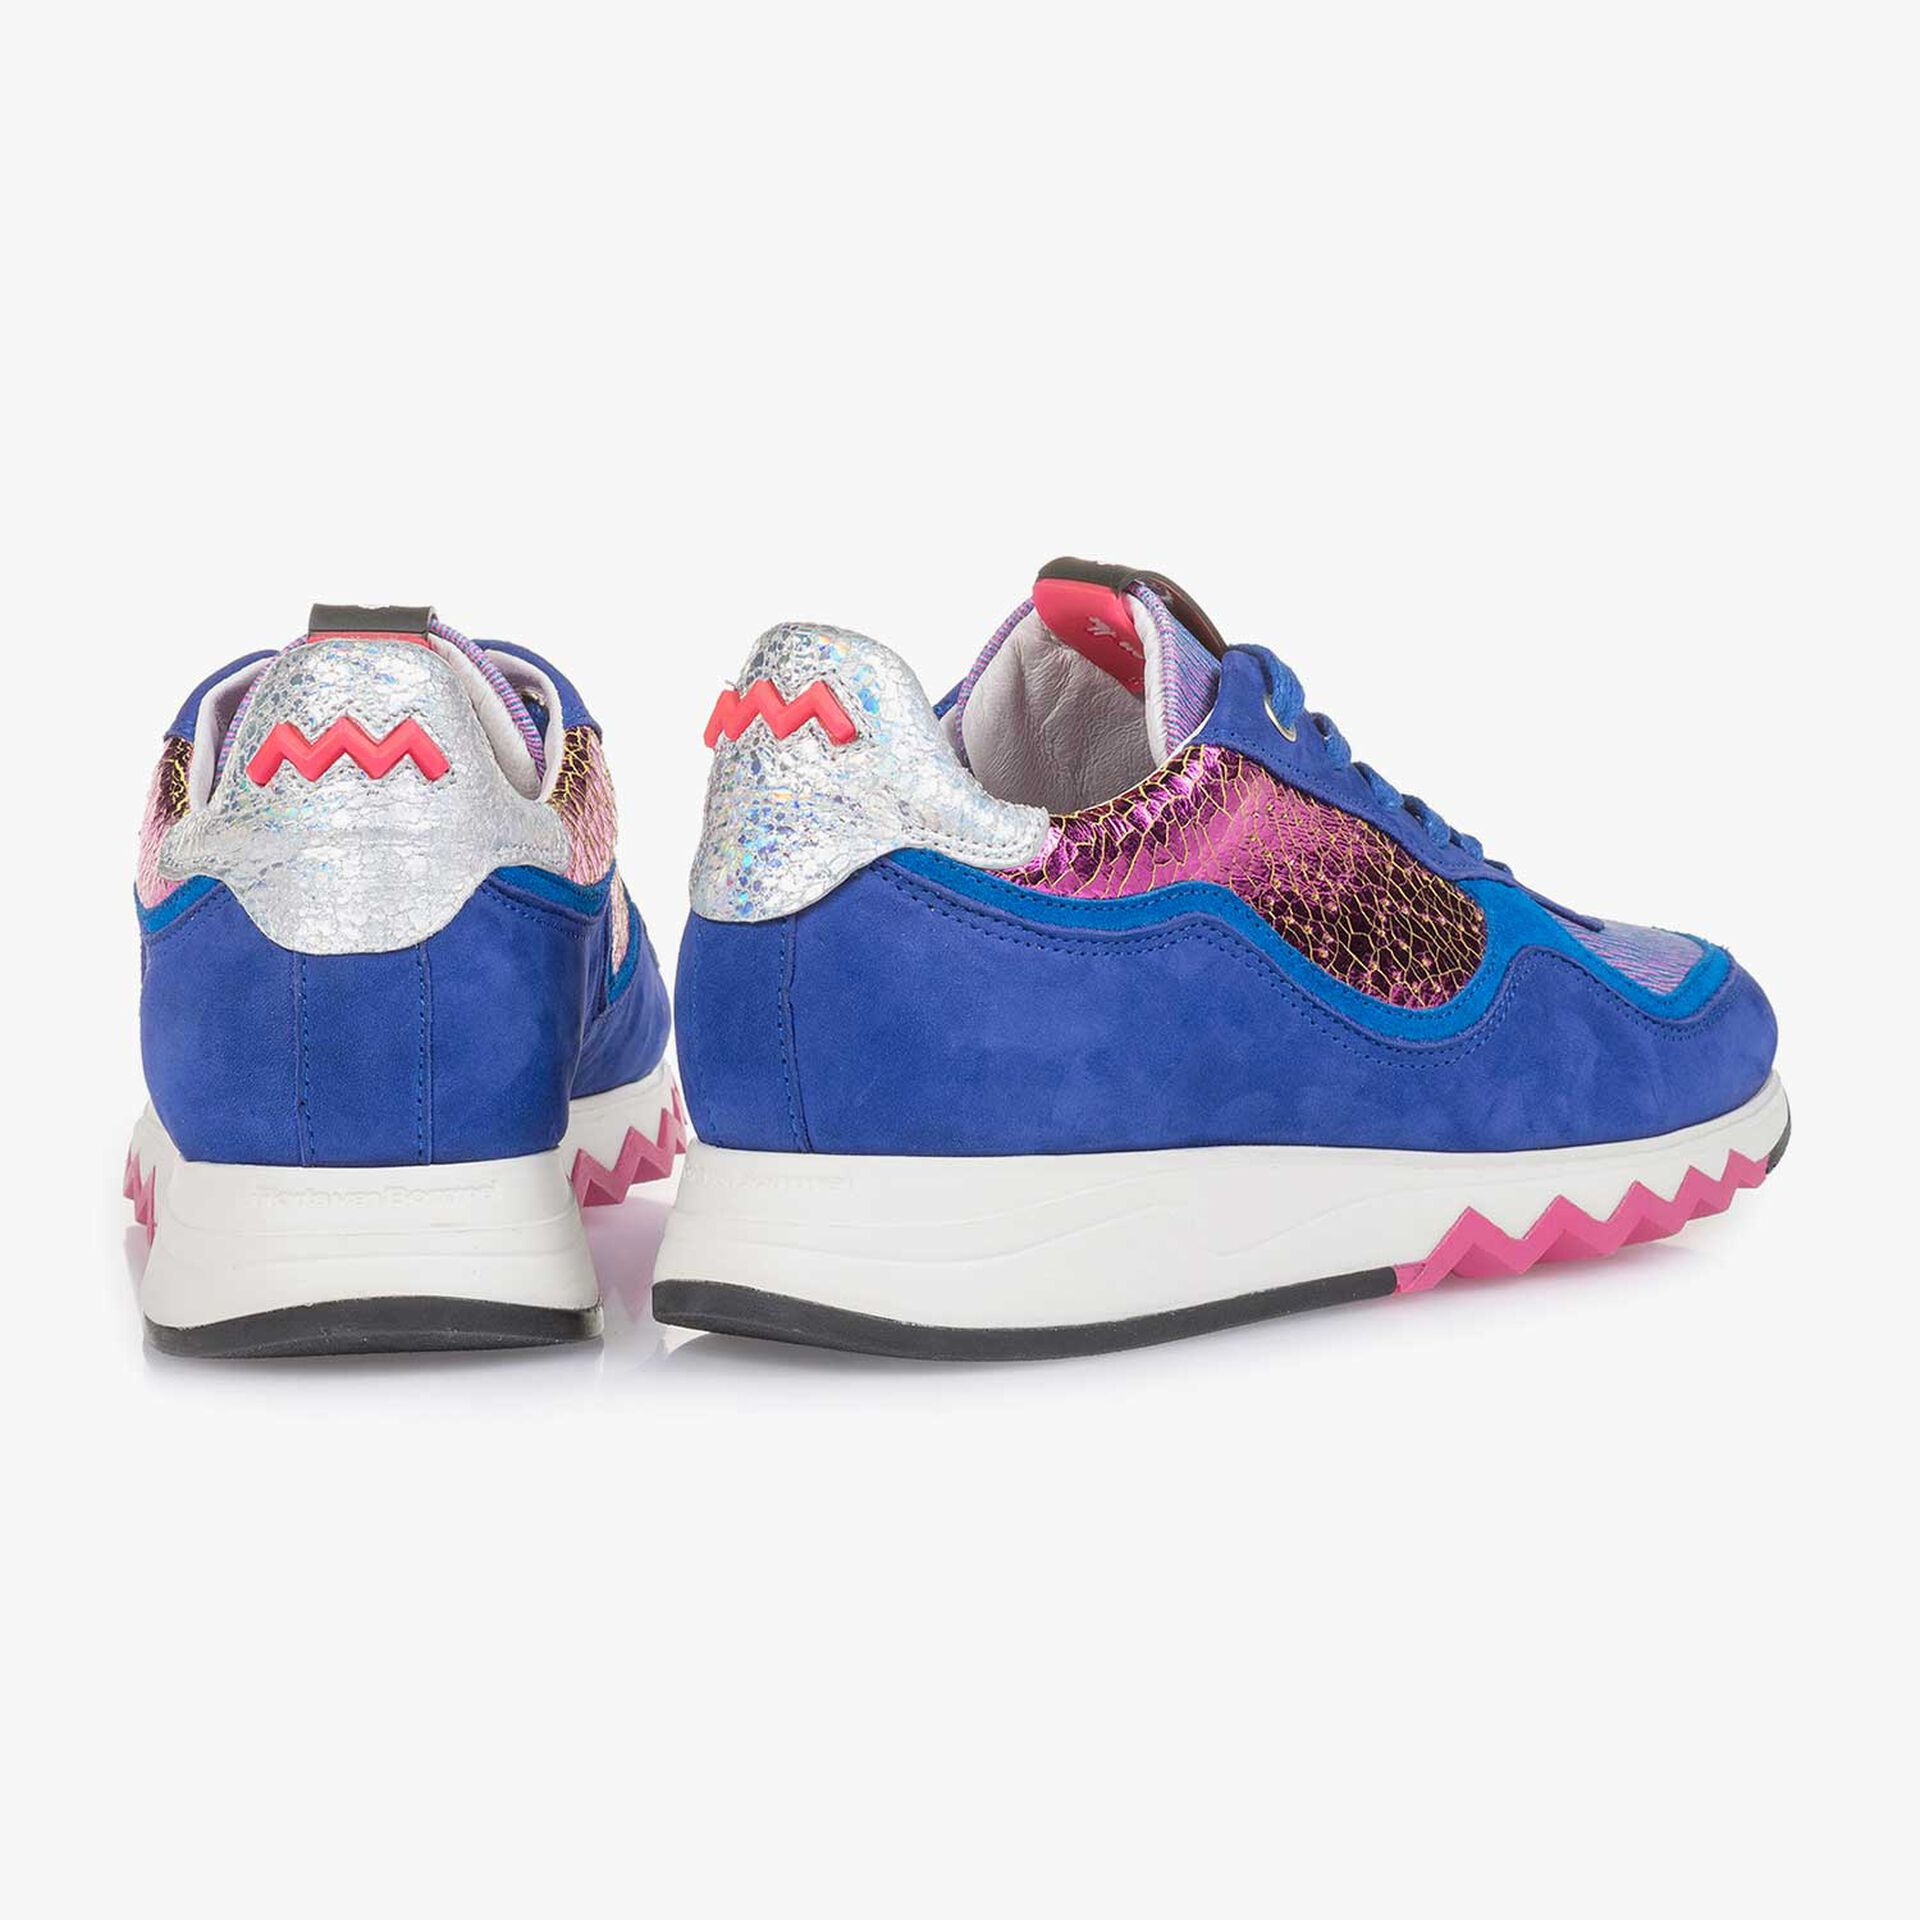 Kobaltblauer Wildleder-Sneaker